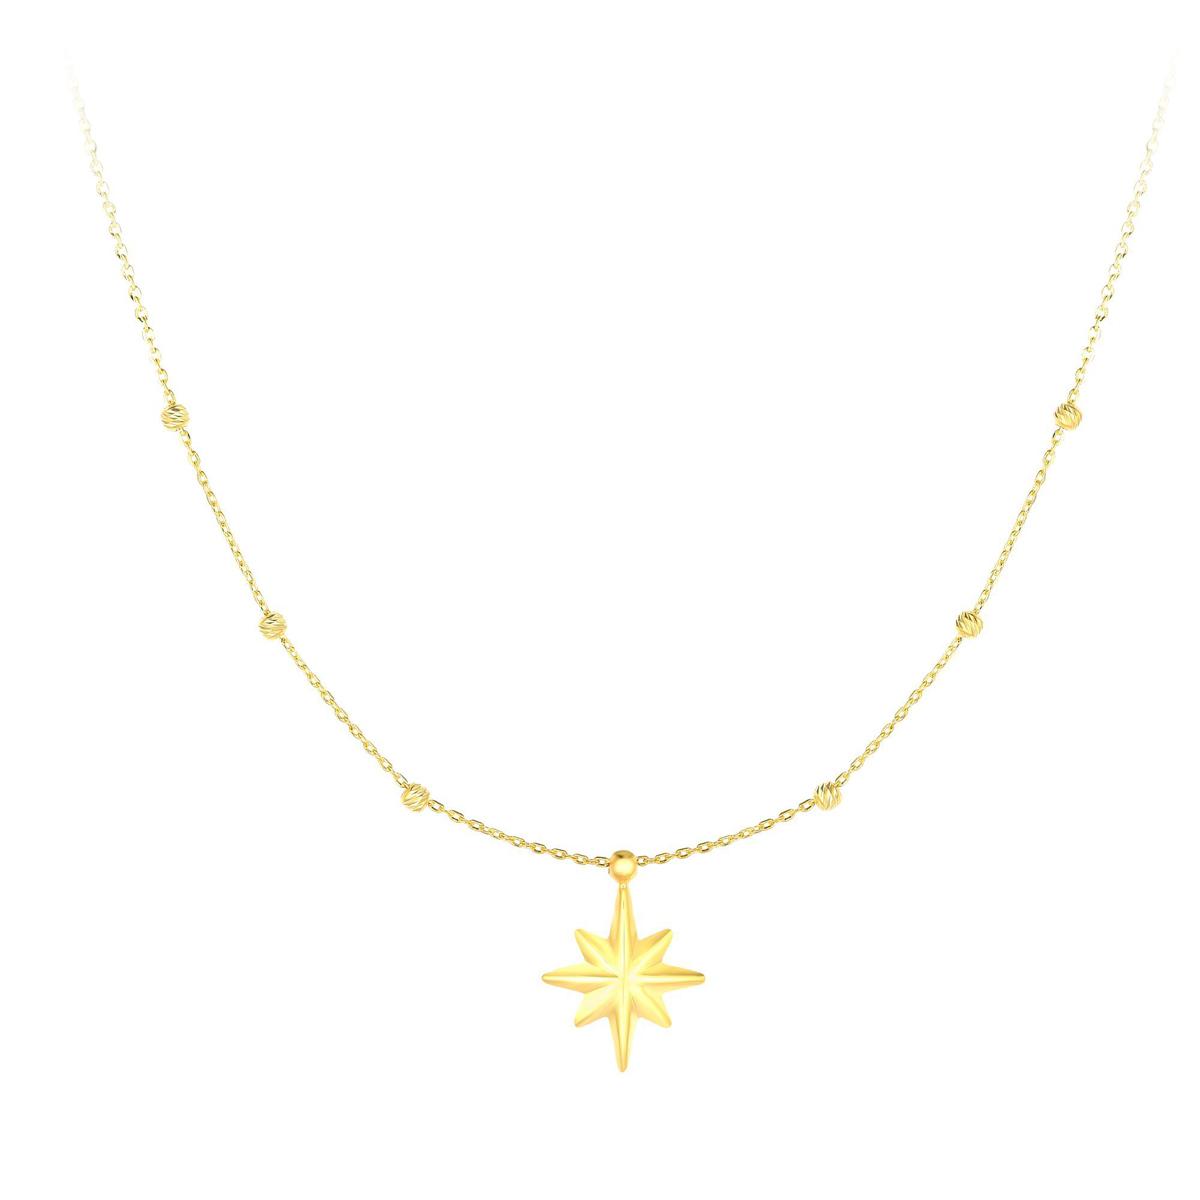 Royal Chain 14 Karat Yellow Gold Star Necklace